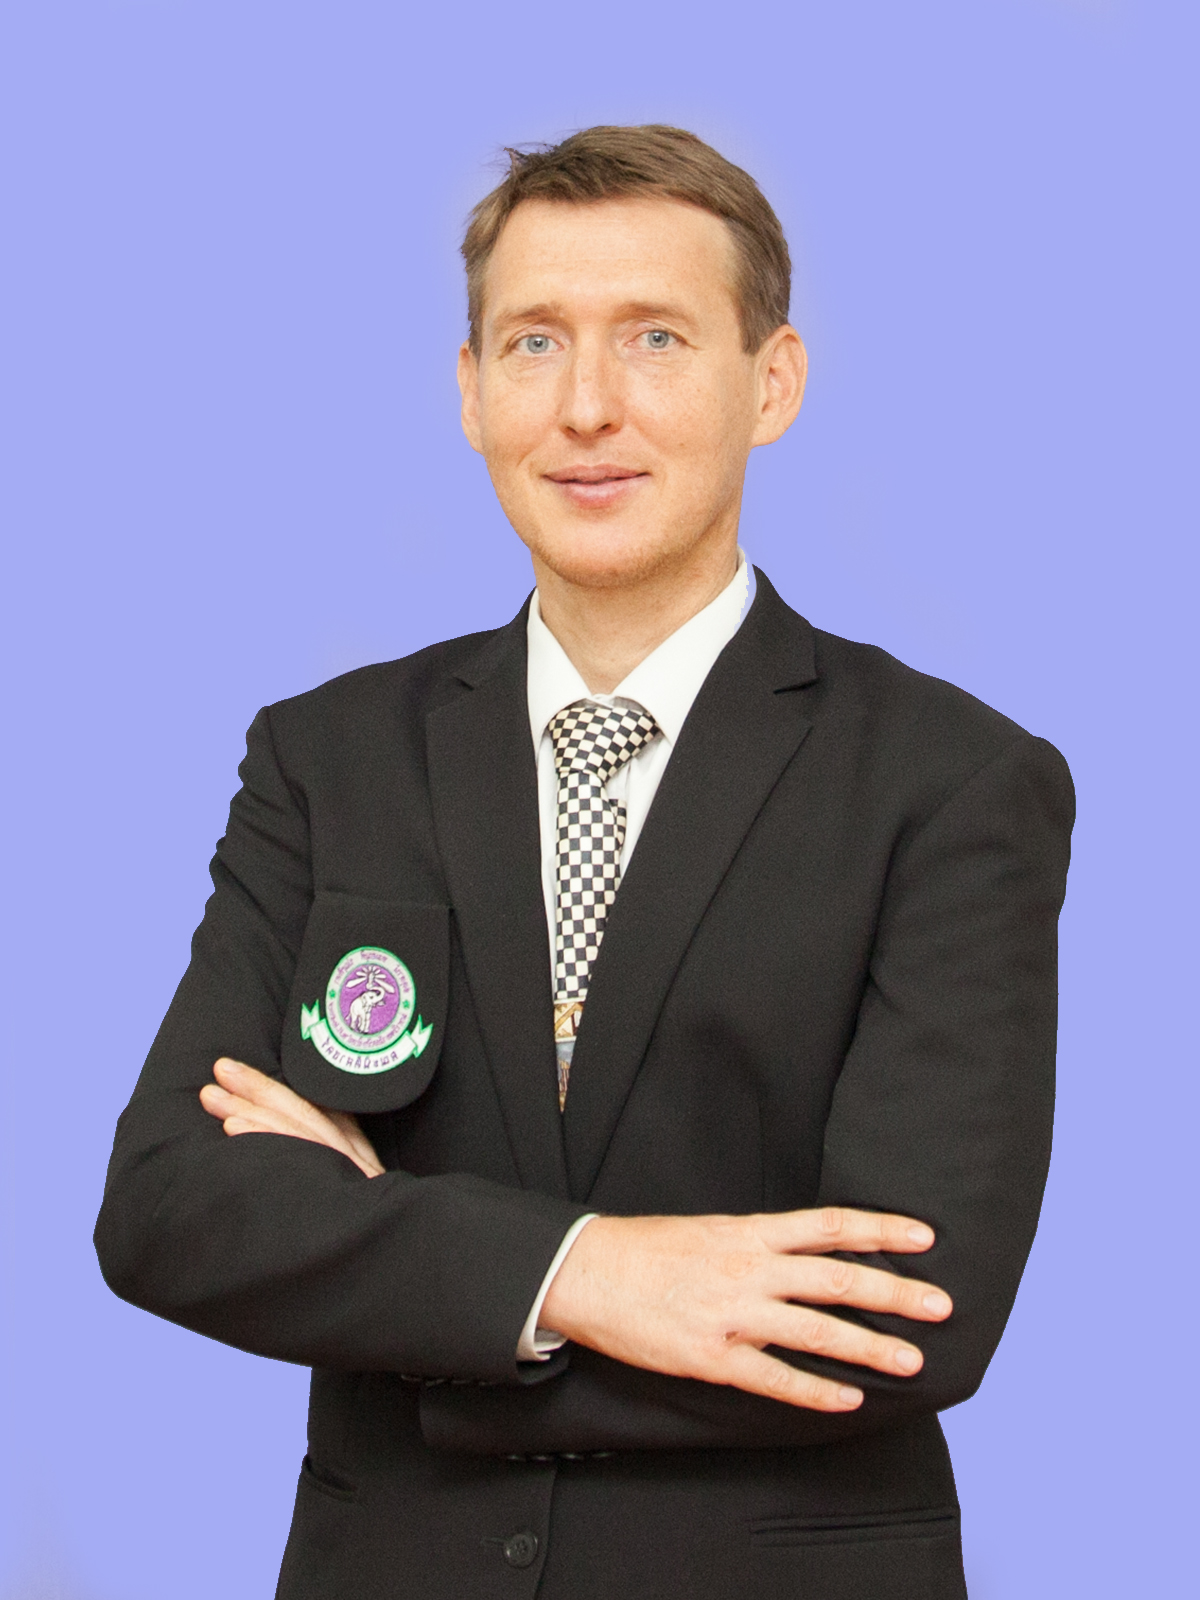 Assistant Professor Dr.Alexandre Chitov <a href='/law2011/files/cv_ua20_en.pdf' target='_blank'>[CV]</a>